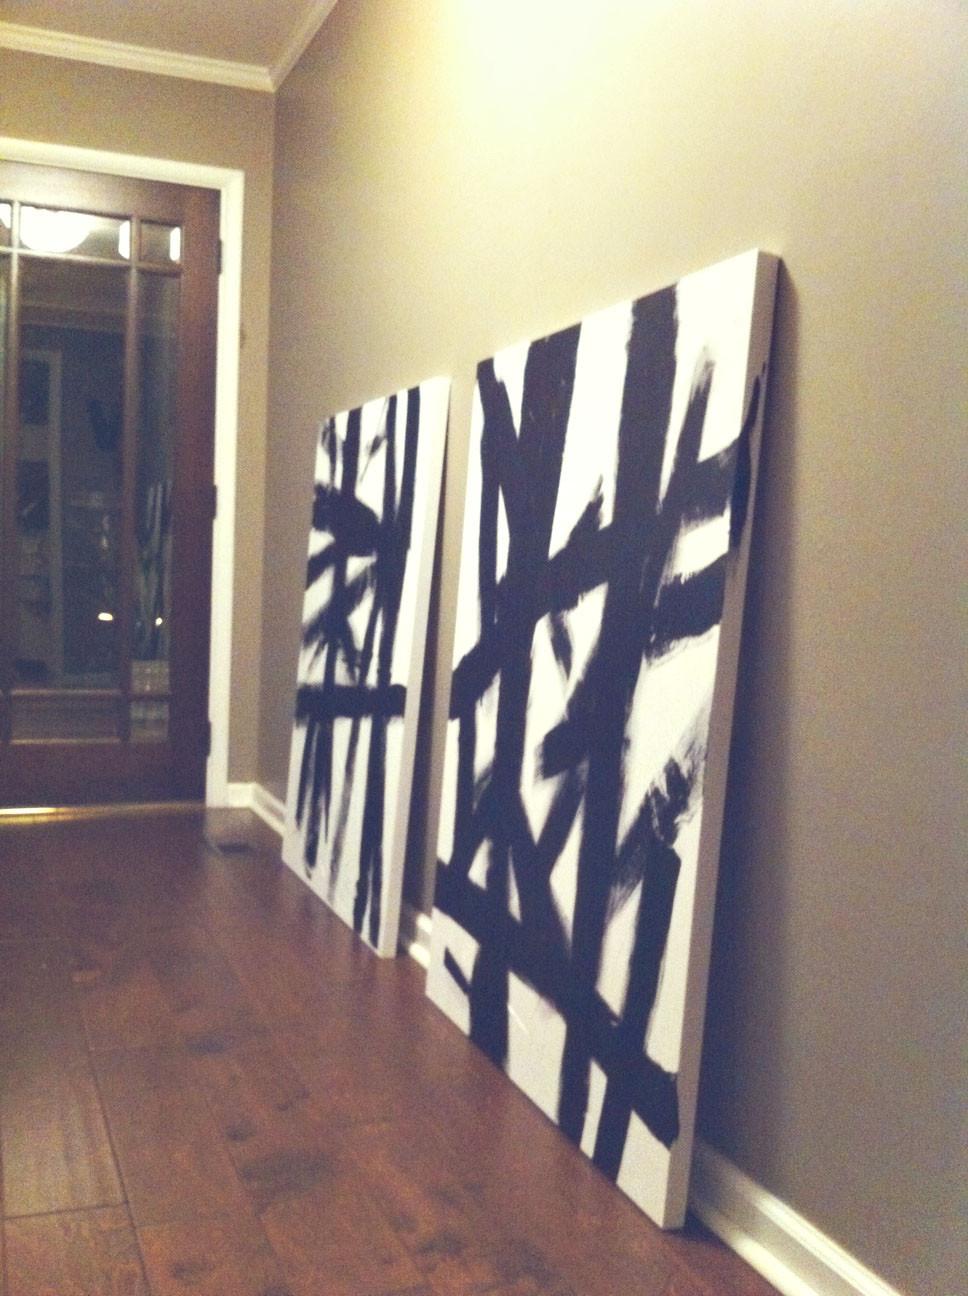 Best ideas about Wall Art Cheap . Save or Pin DIY Cheap Wall Art Now.